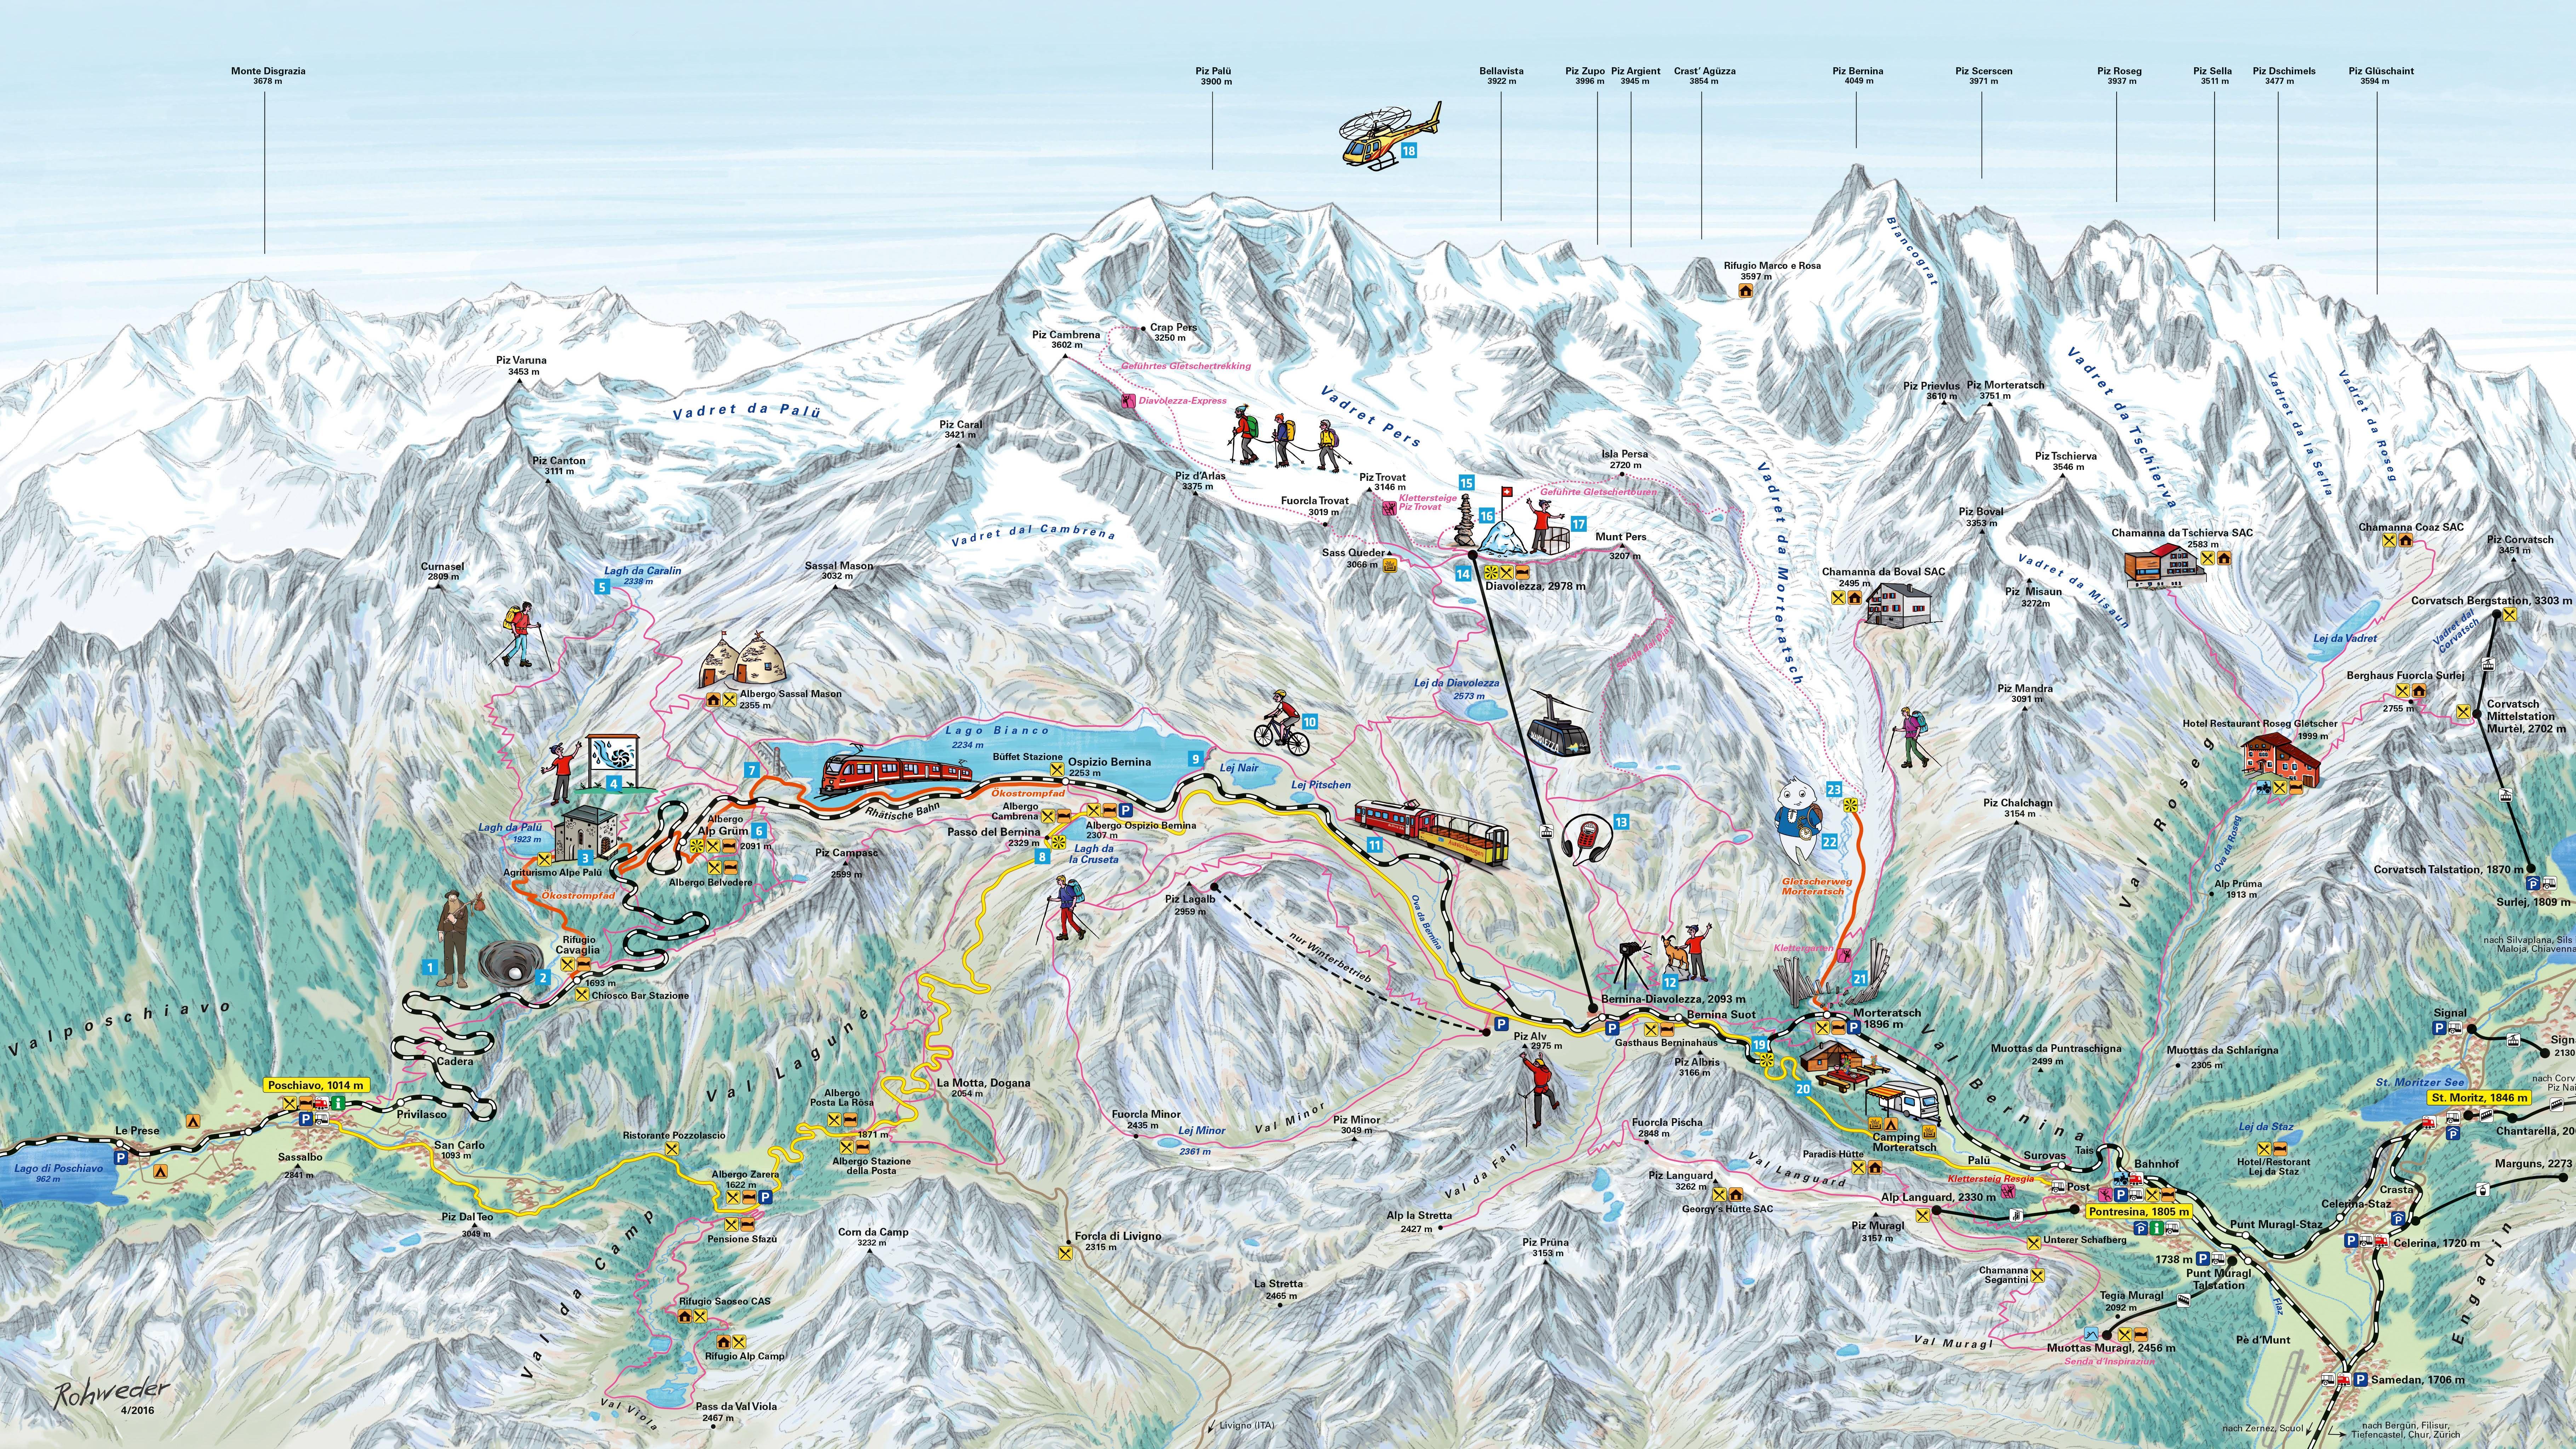 Bernina Glaciers Tourist Map Erlebnis Engadin Natur